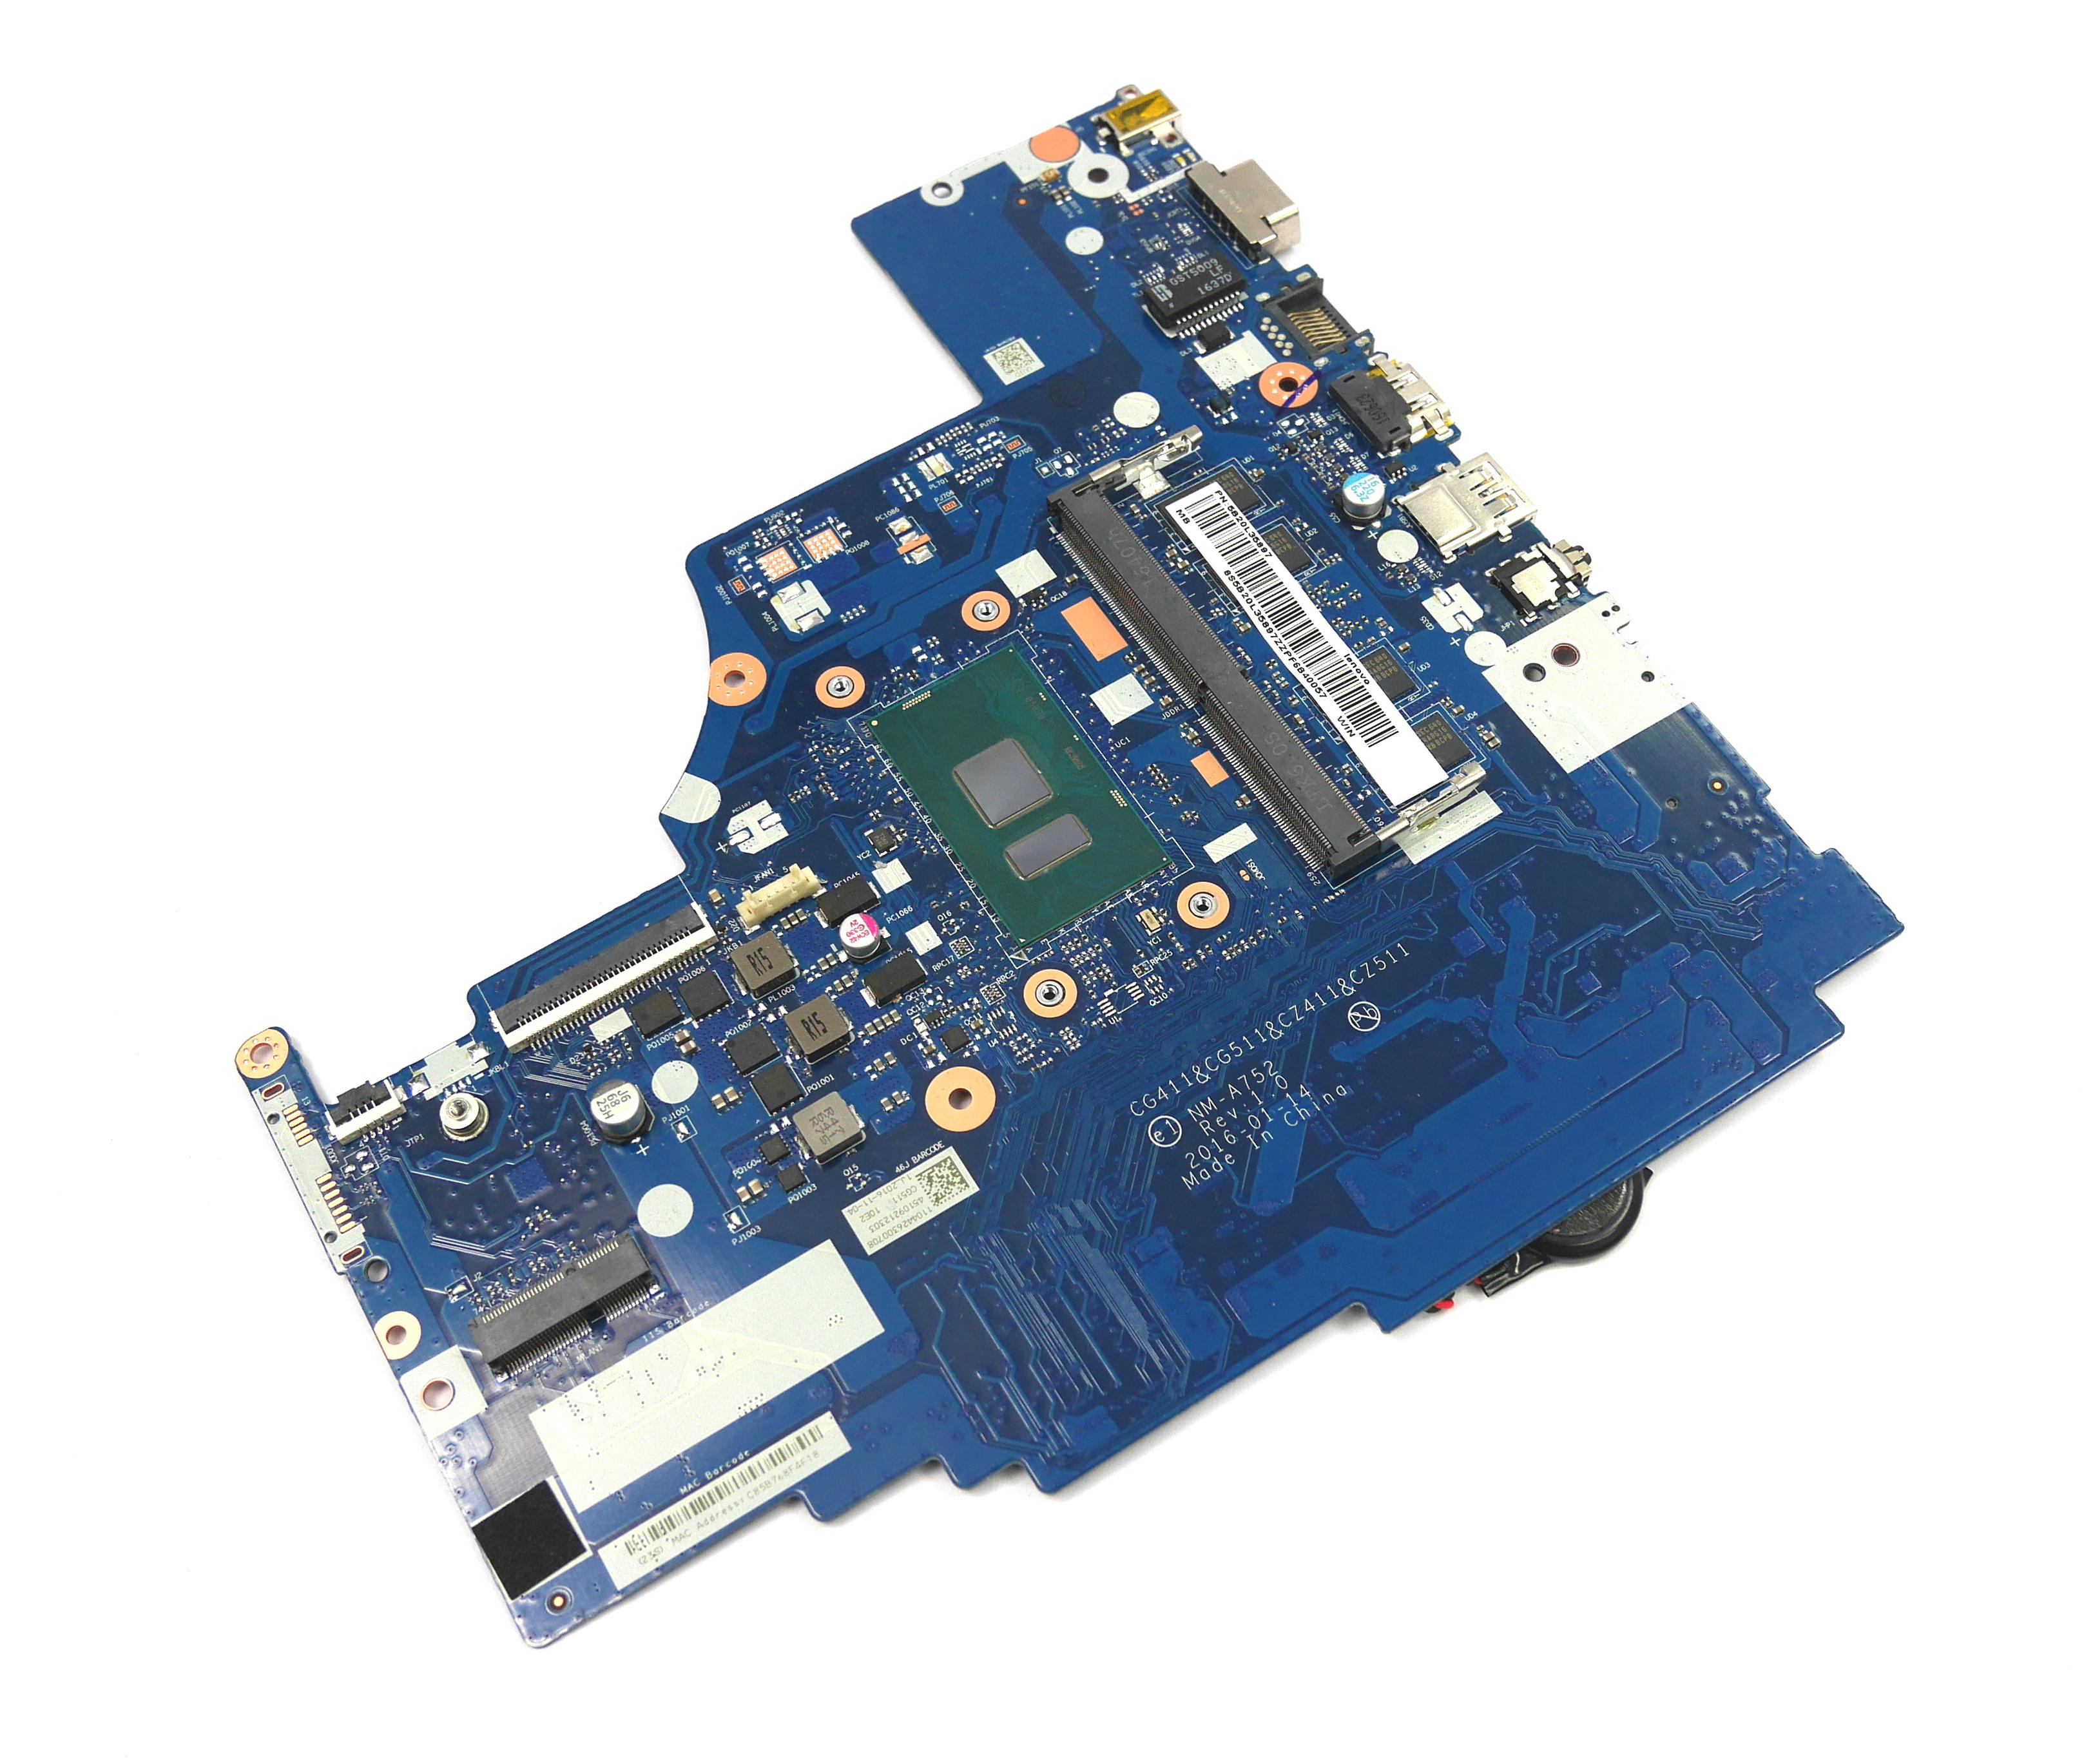 5B20L35897 Lenovo IdeaPad 310 (310-15ISK) Motherboard with Intel i5-6200U CPU